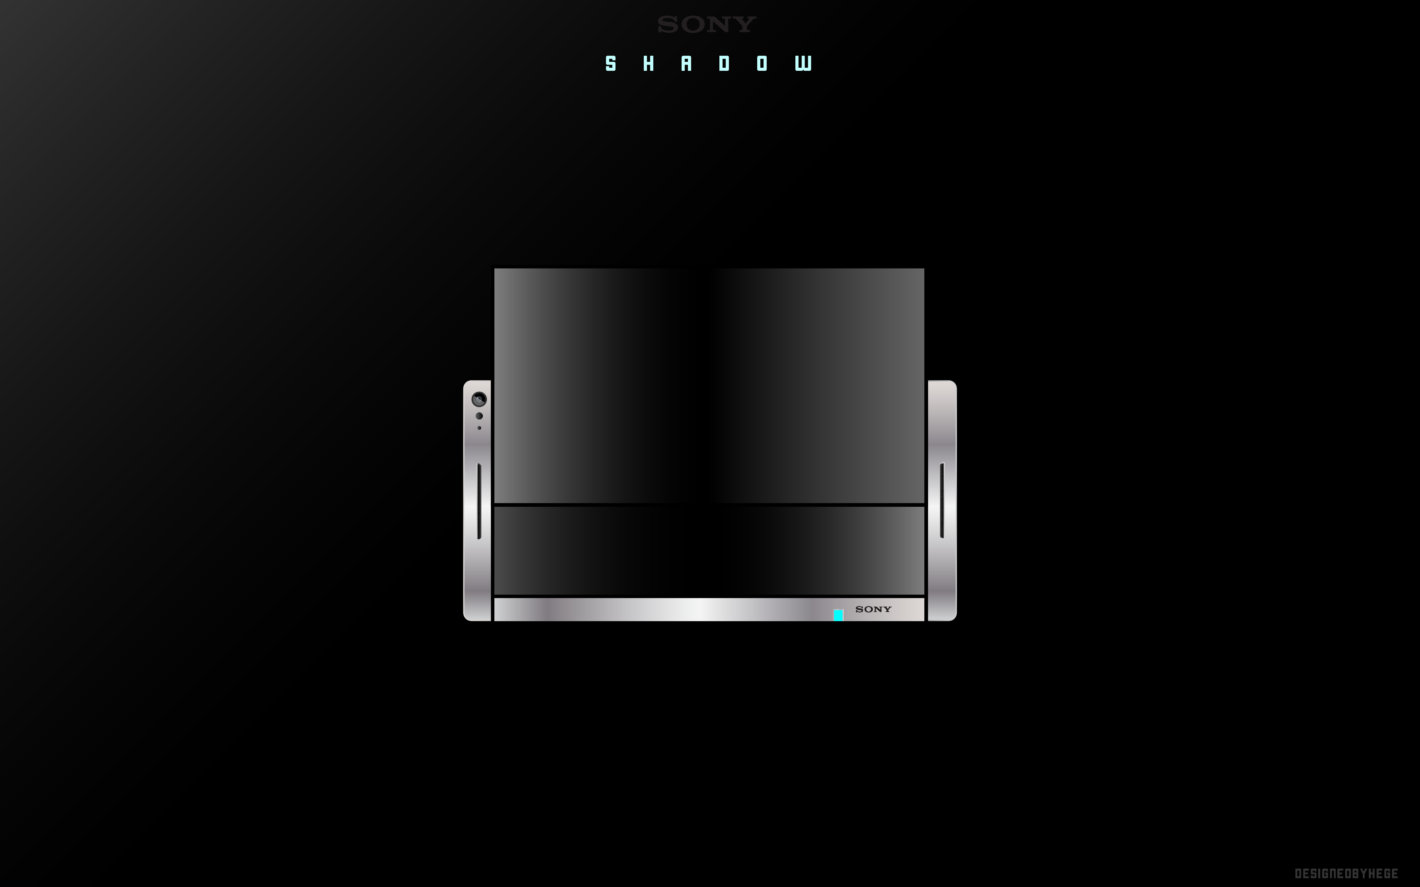 Sony-Shadow-concept_1-1420x887